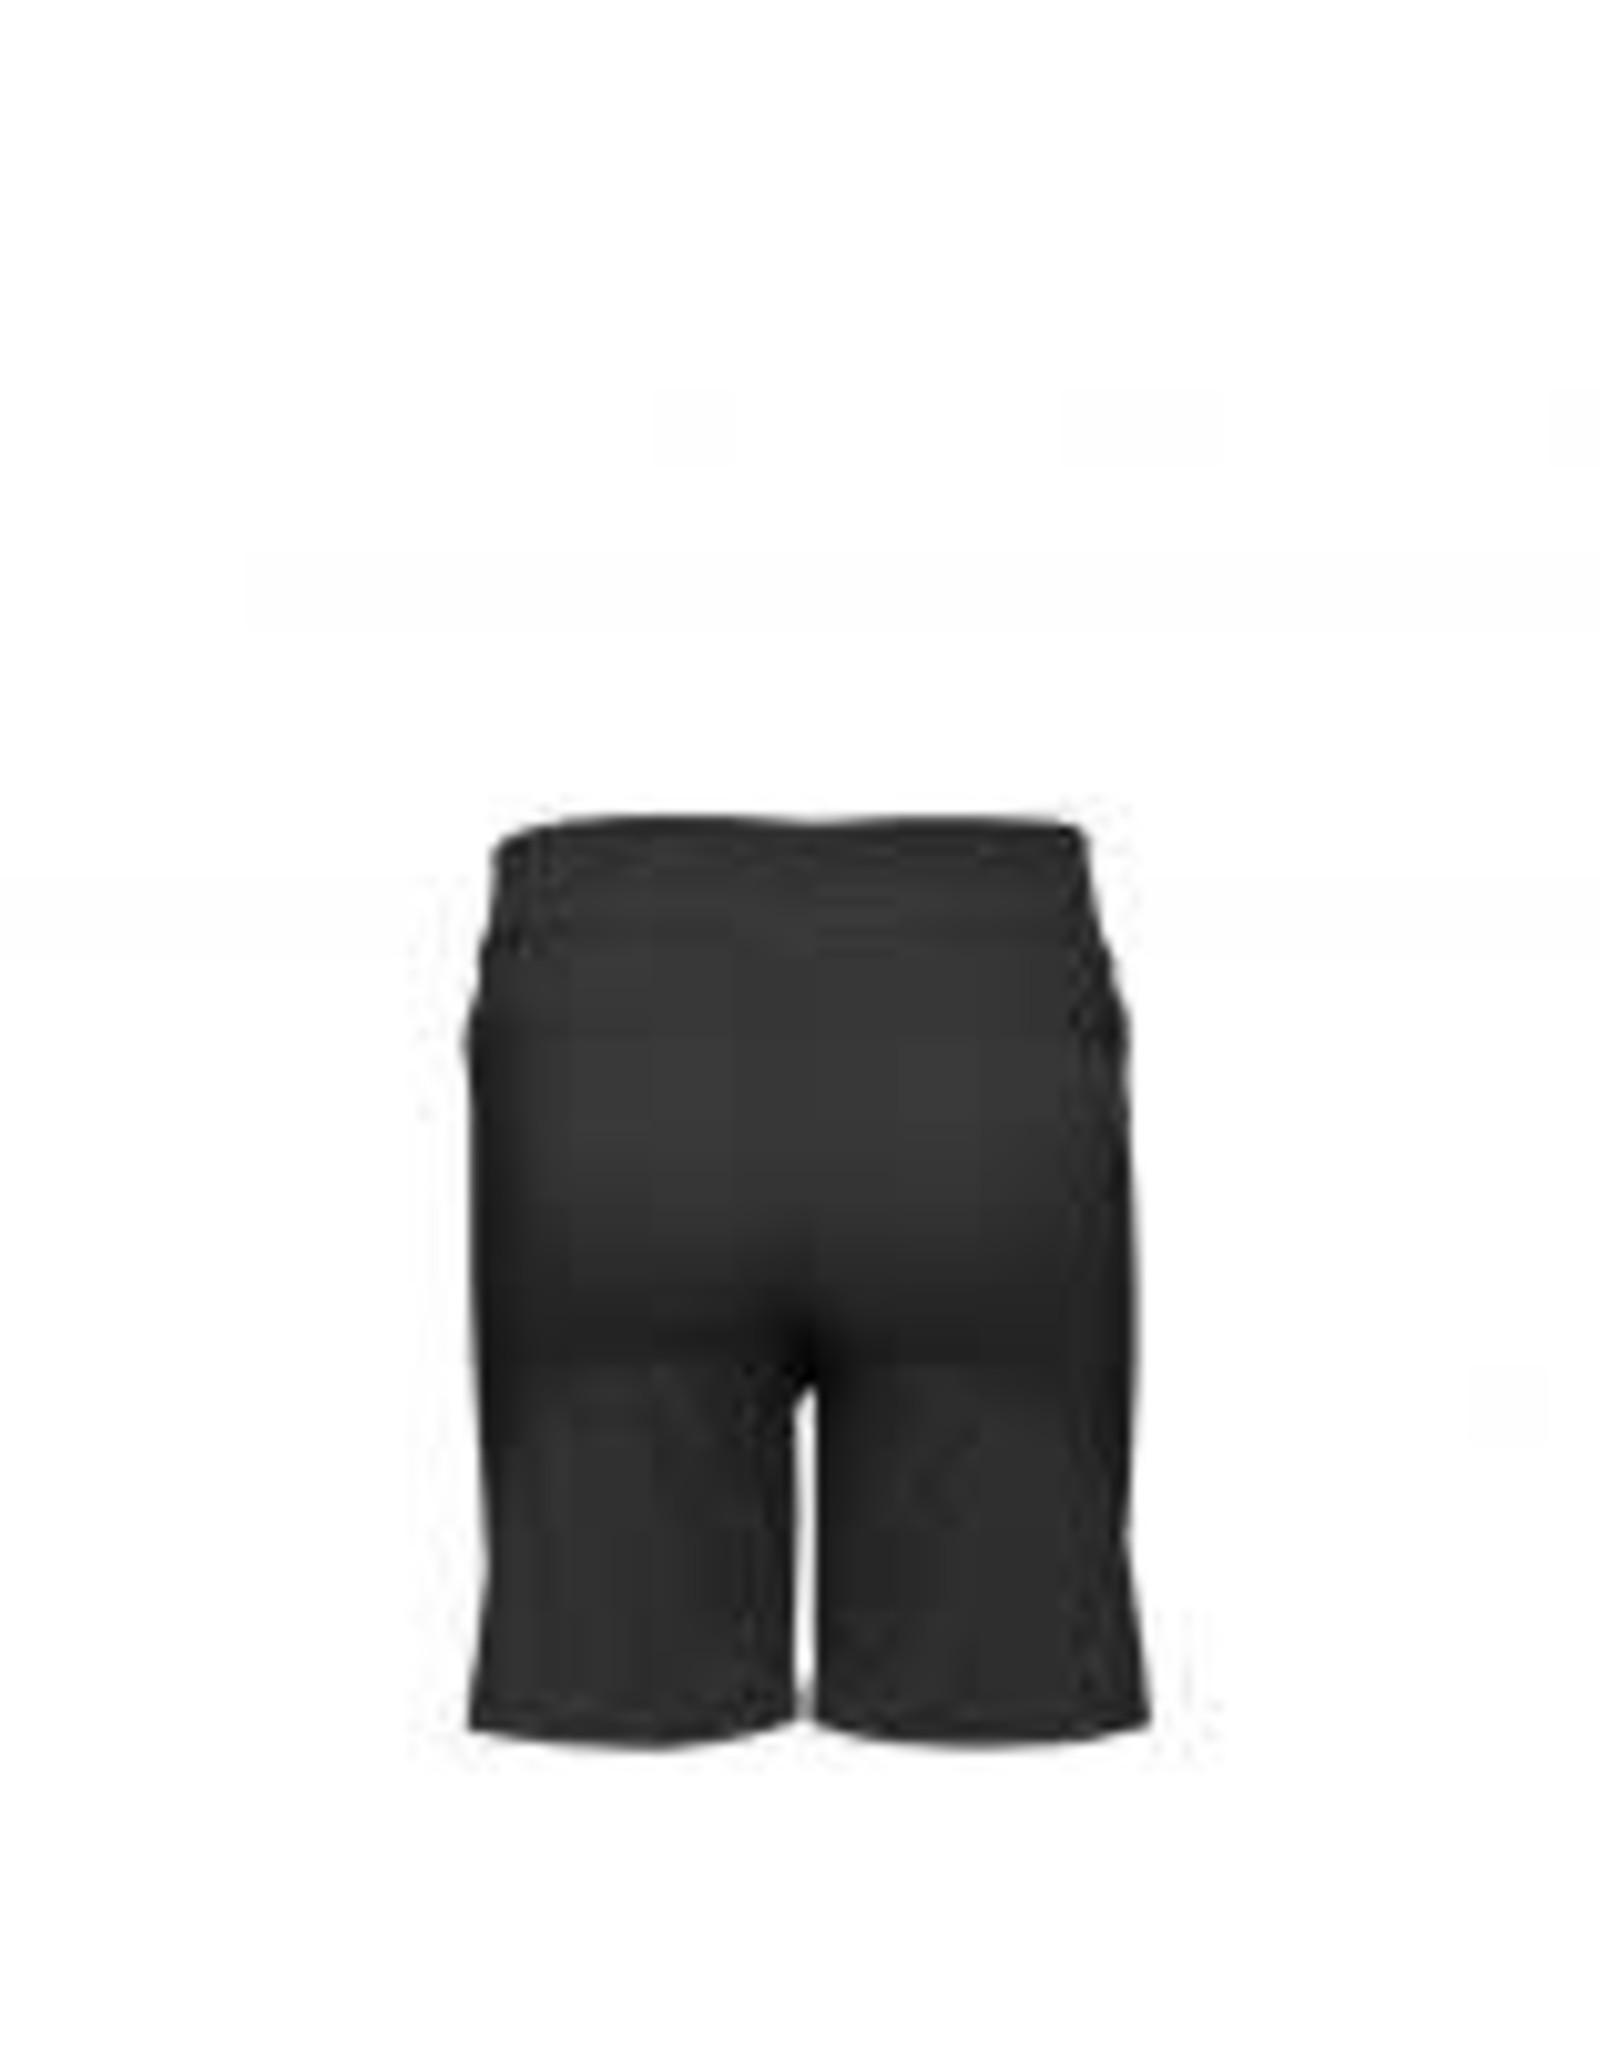 Papillon 9PK3517 Girls Short pockets